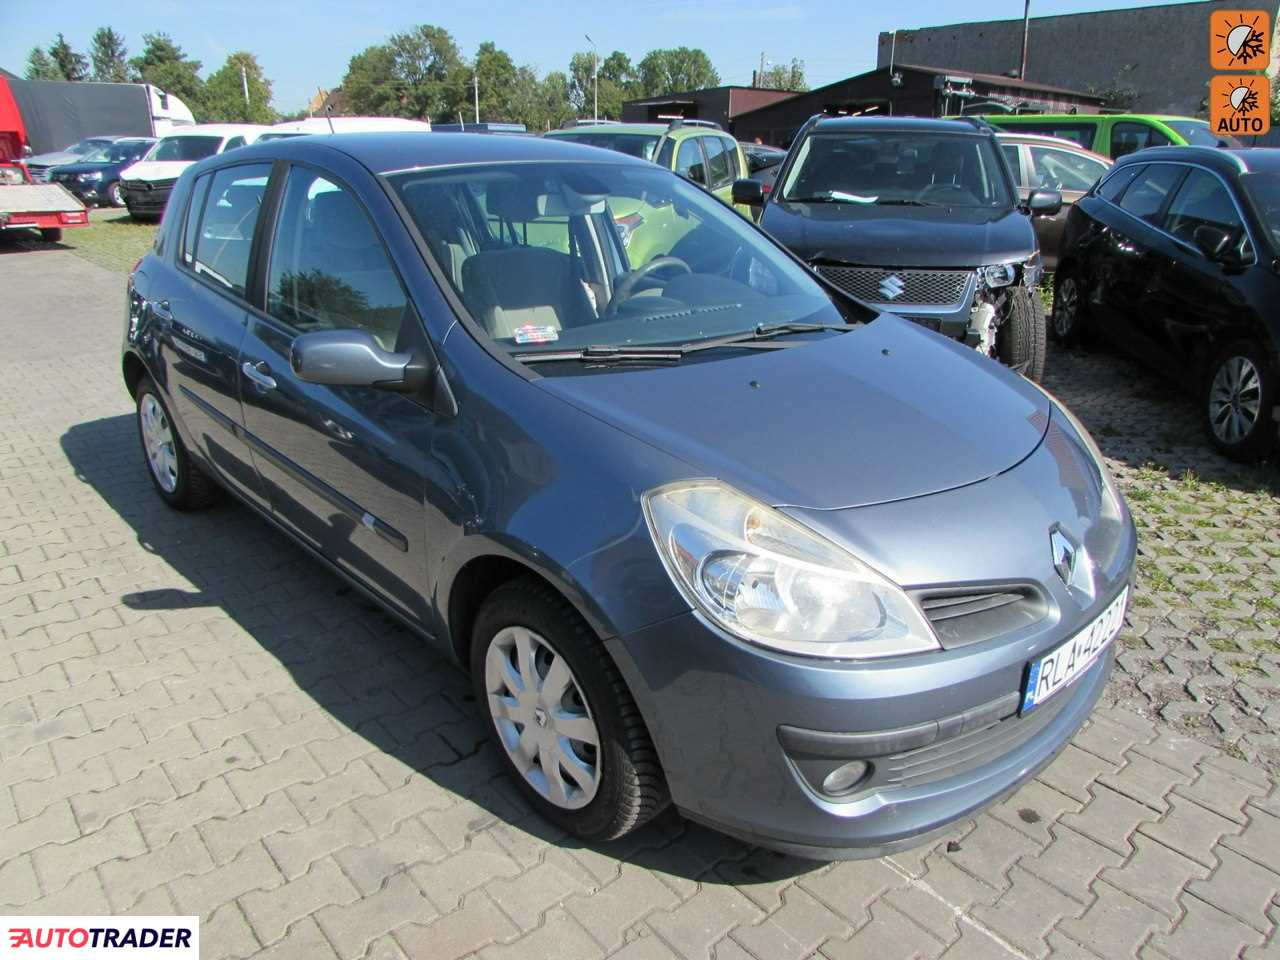 Renault Clio 2006 1.6 88 KM